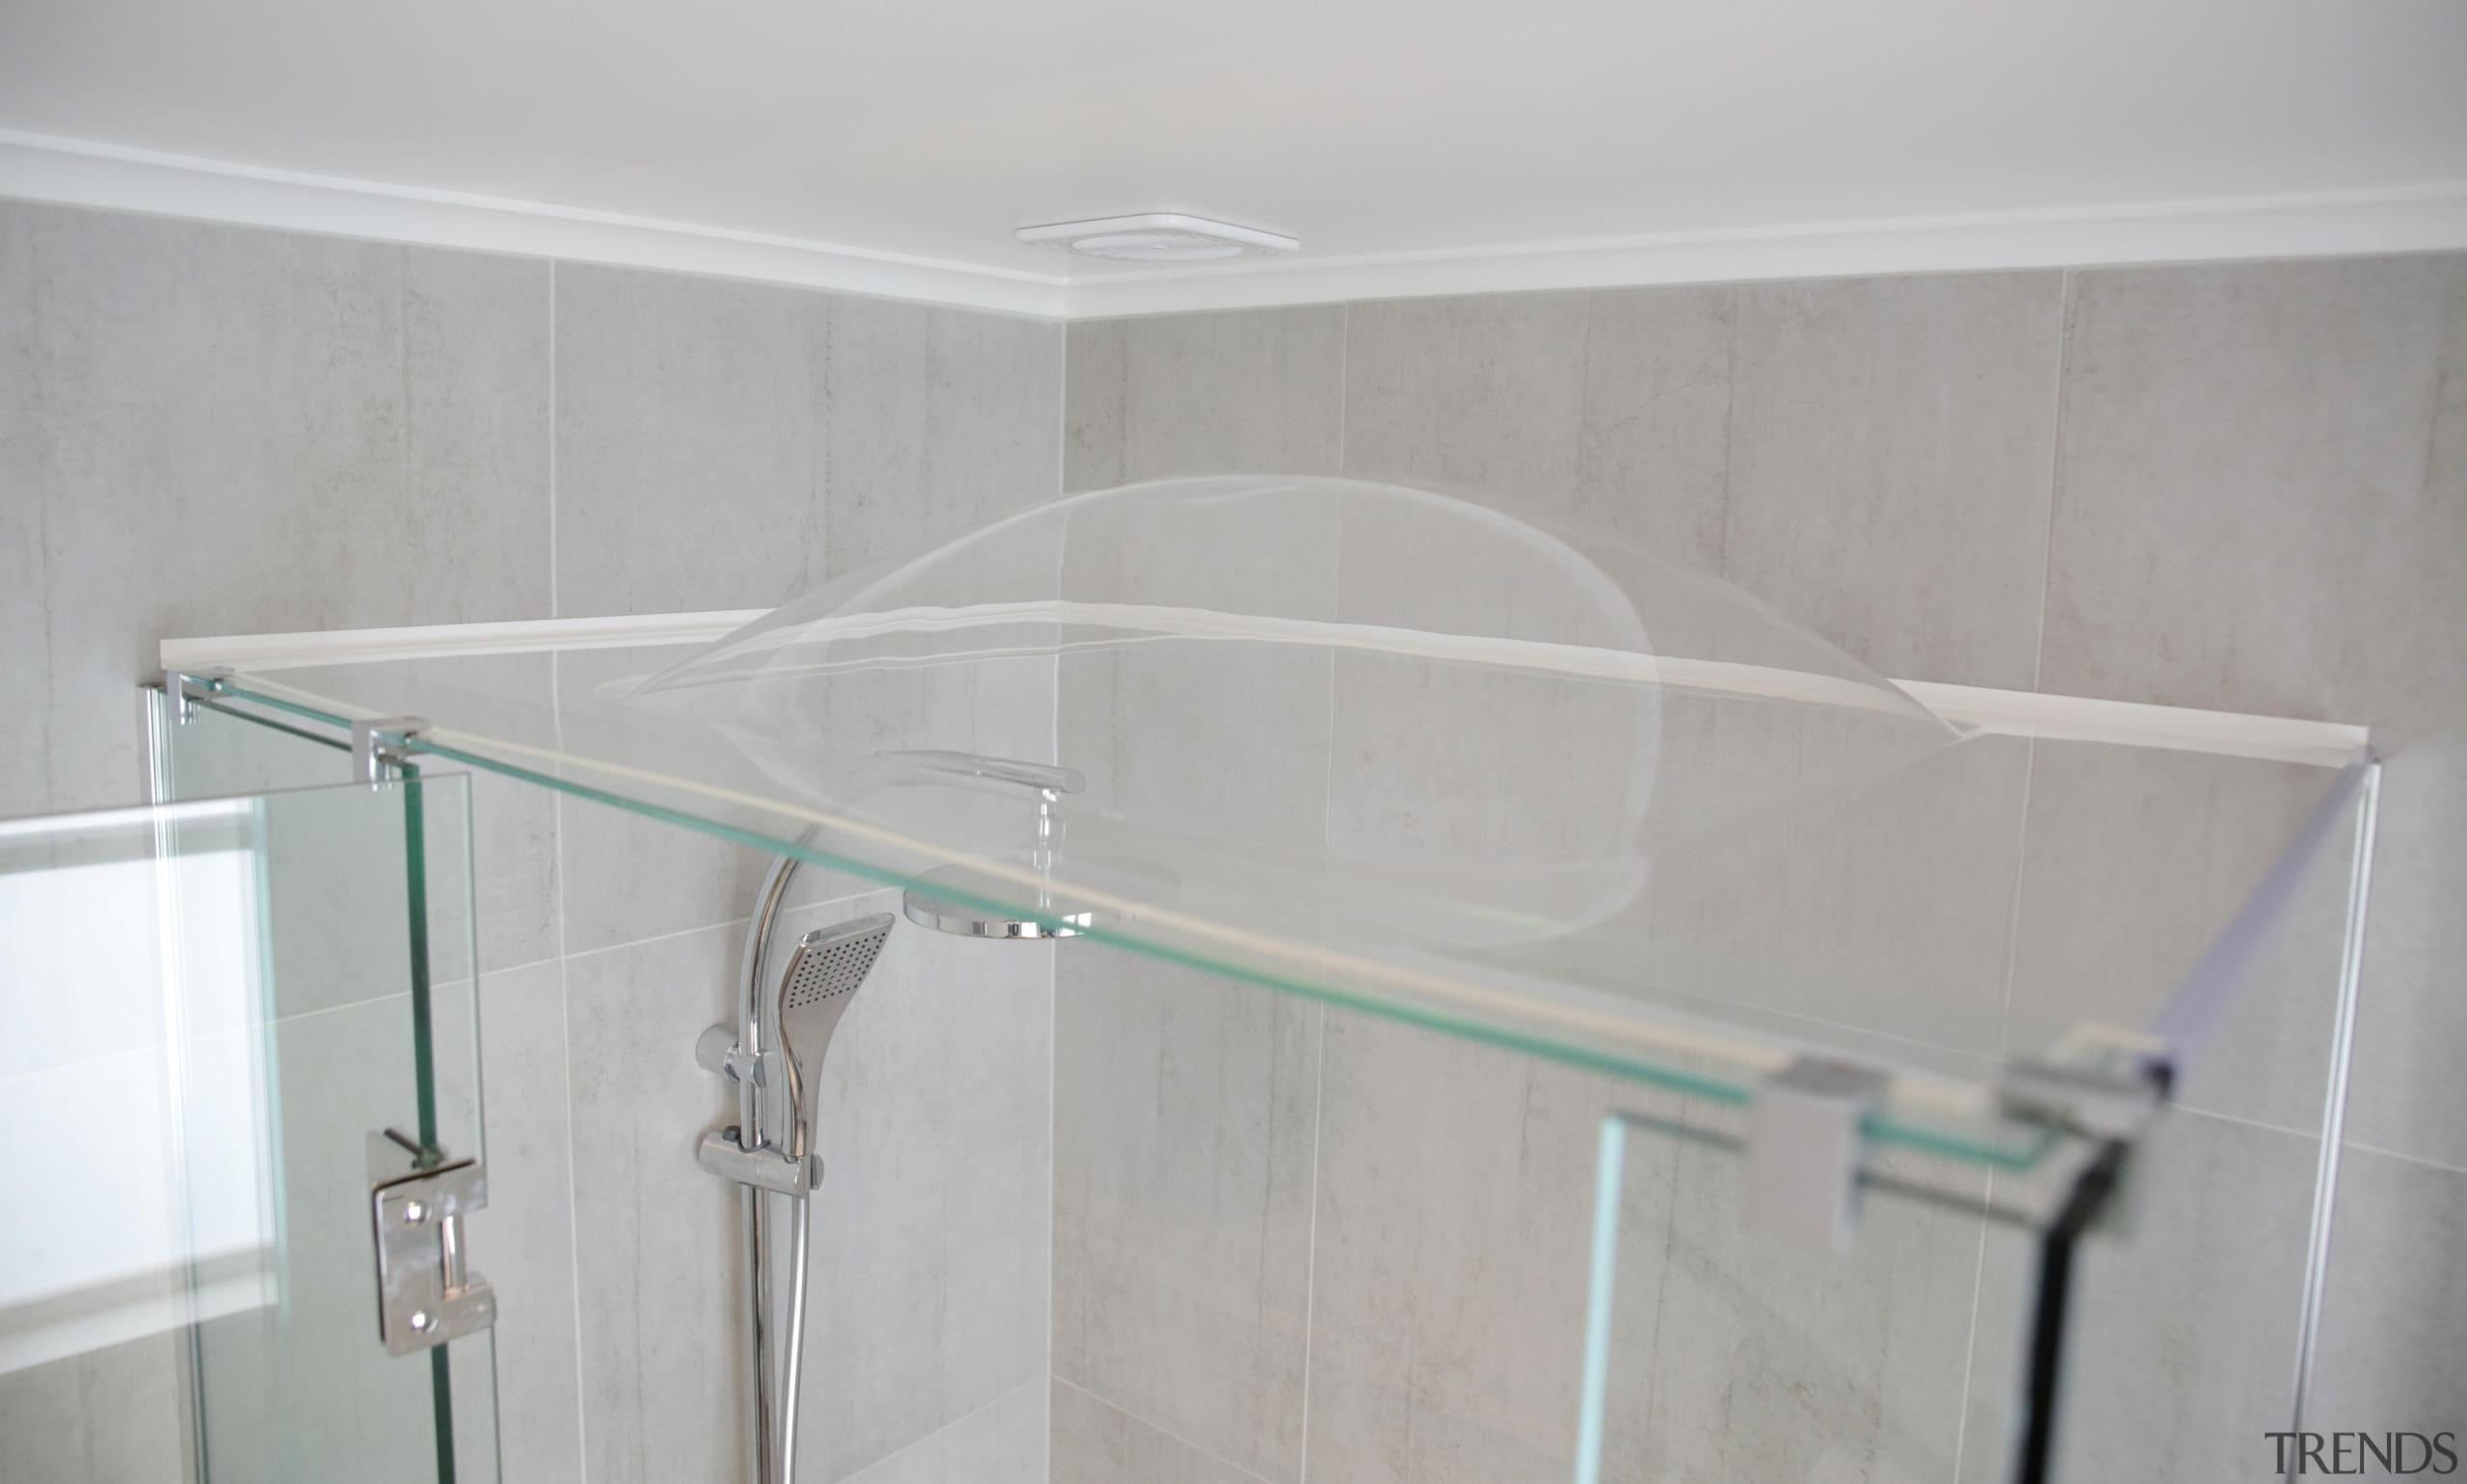 5.jpg - bathroom   glass   plumbing fixture bathroom, glass, plumbing fixture, product, room, sink, tap, gray